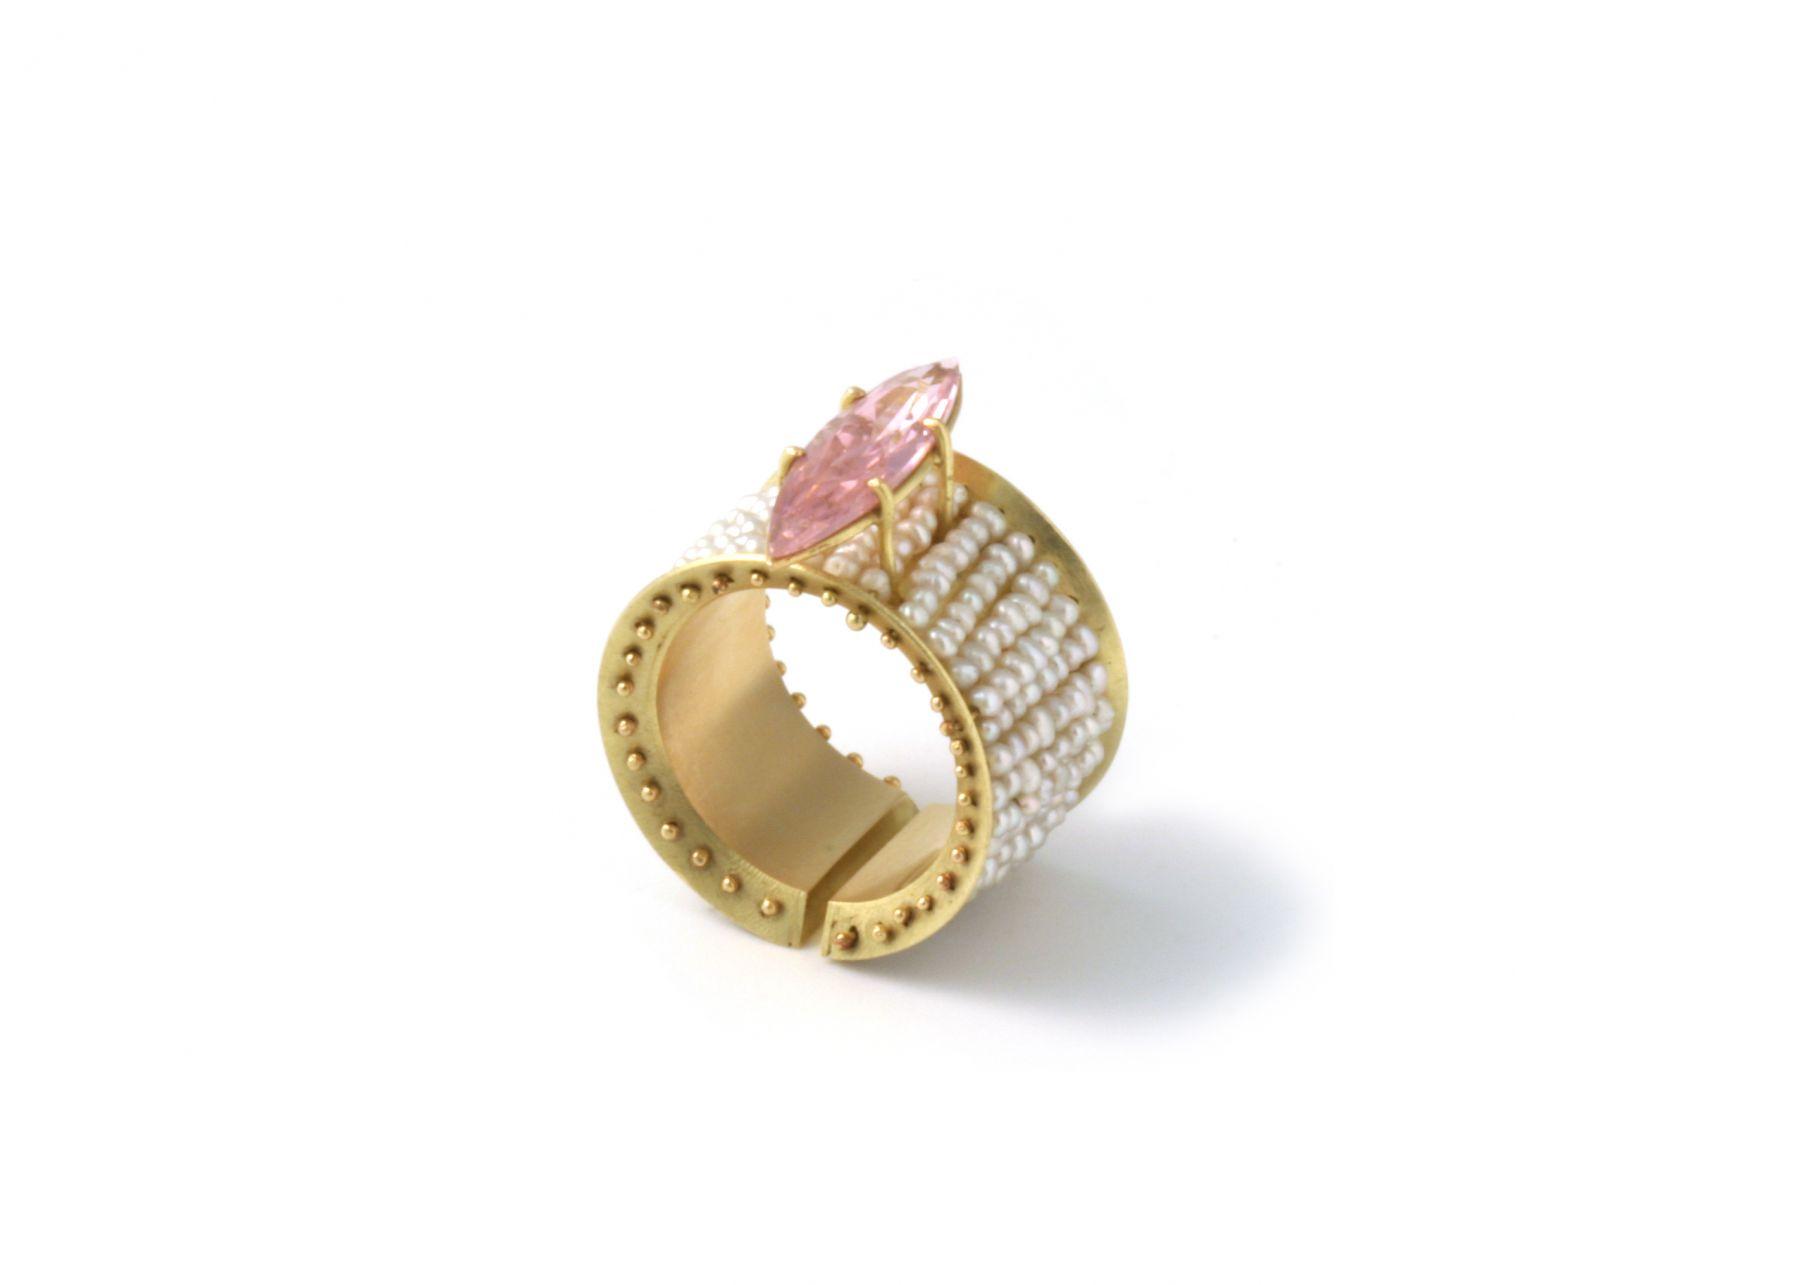 Philip Sajet, jewelry, Dutch Design, gold, enamel, pearls